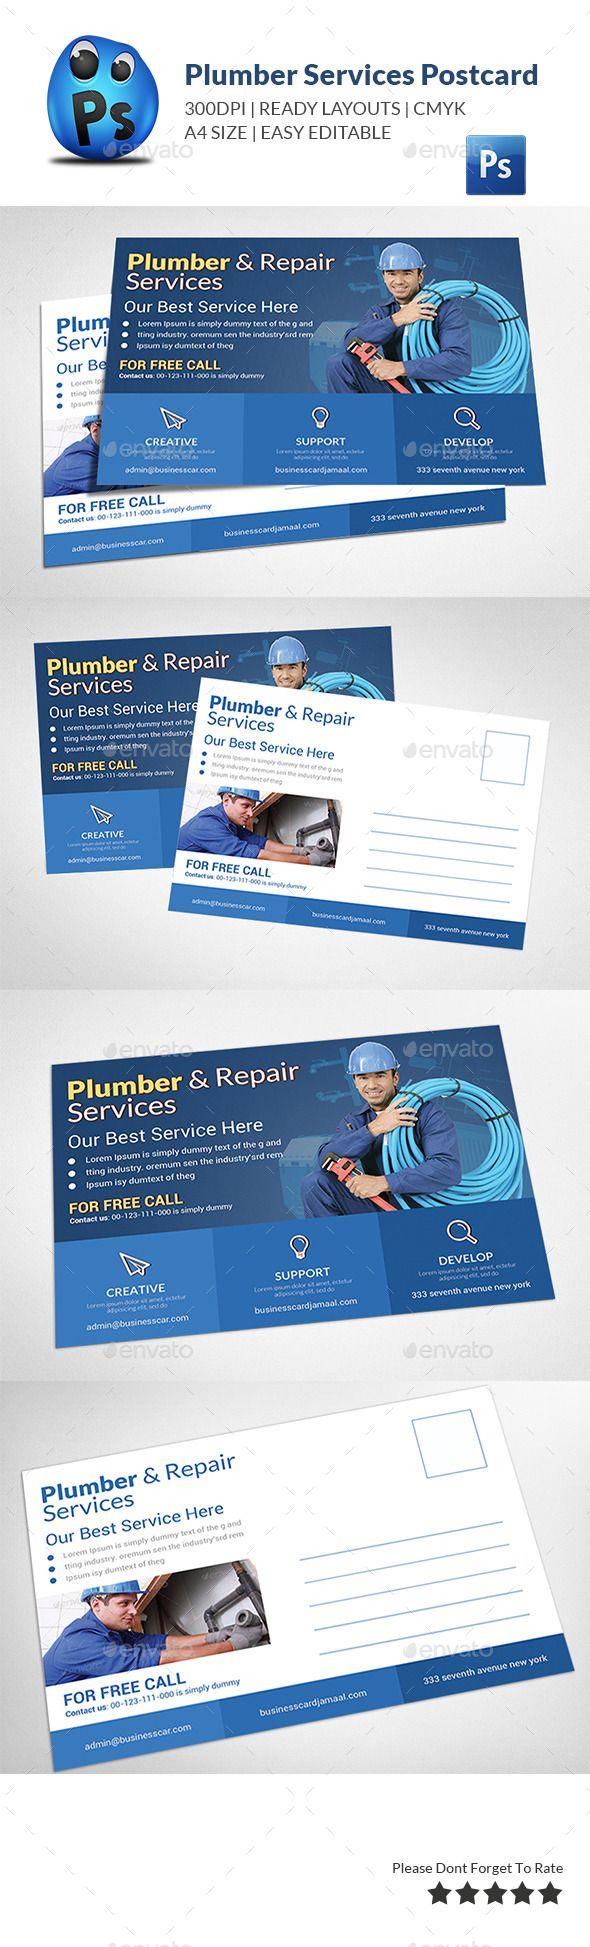 best ideas about postcard template post card plumber service postcard template photoshop psd postcard template drain available here rarr